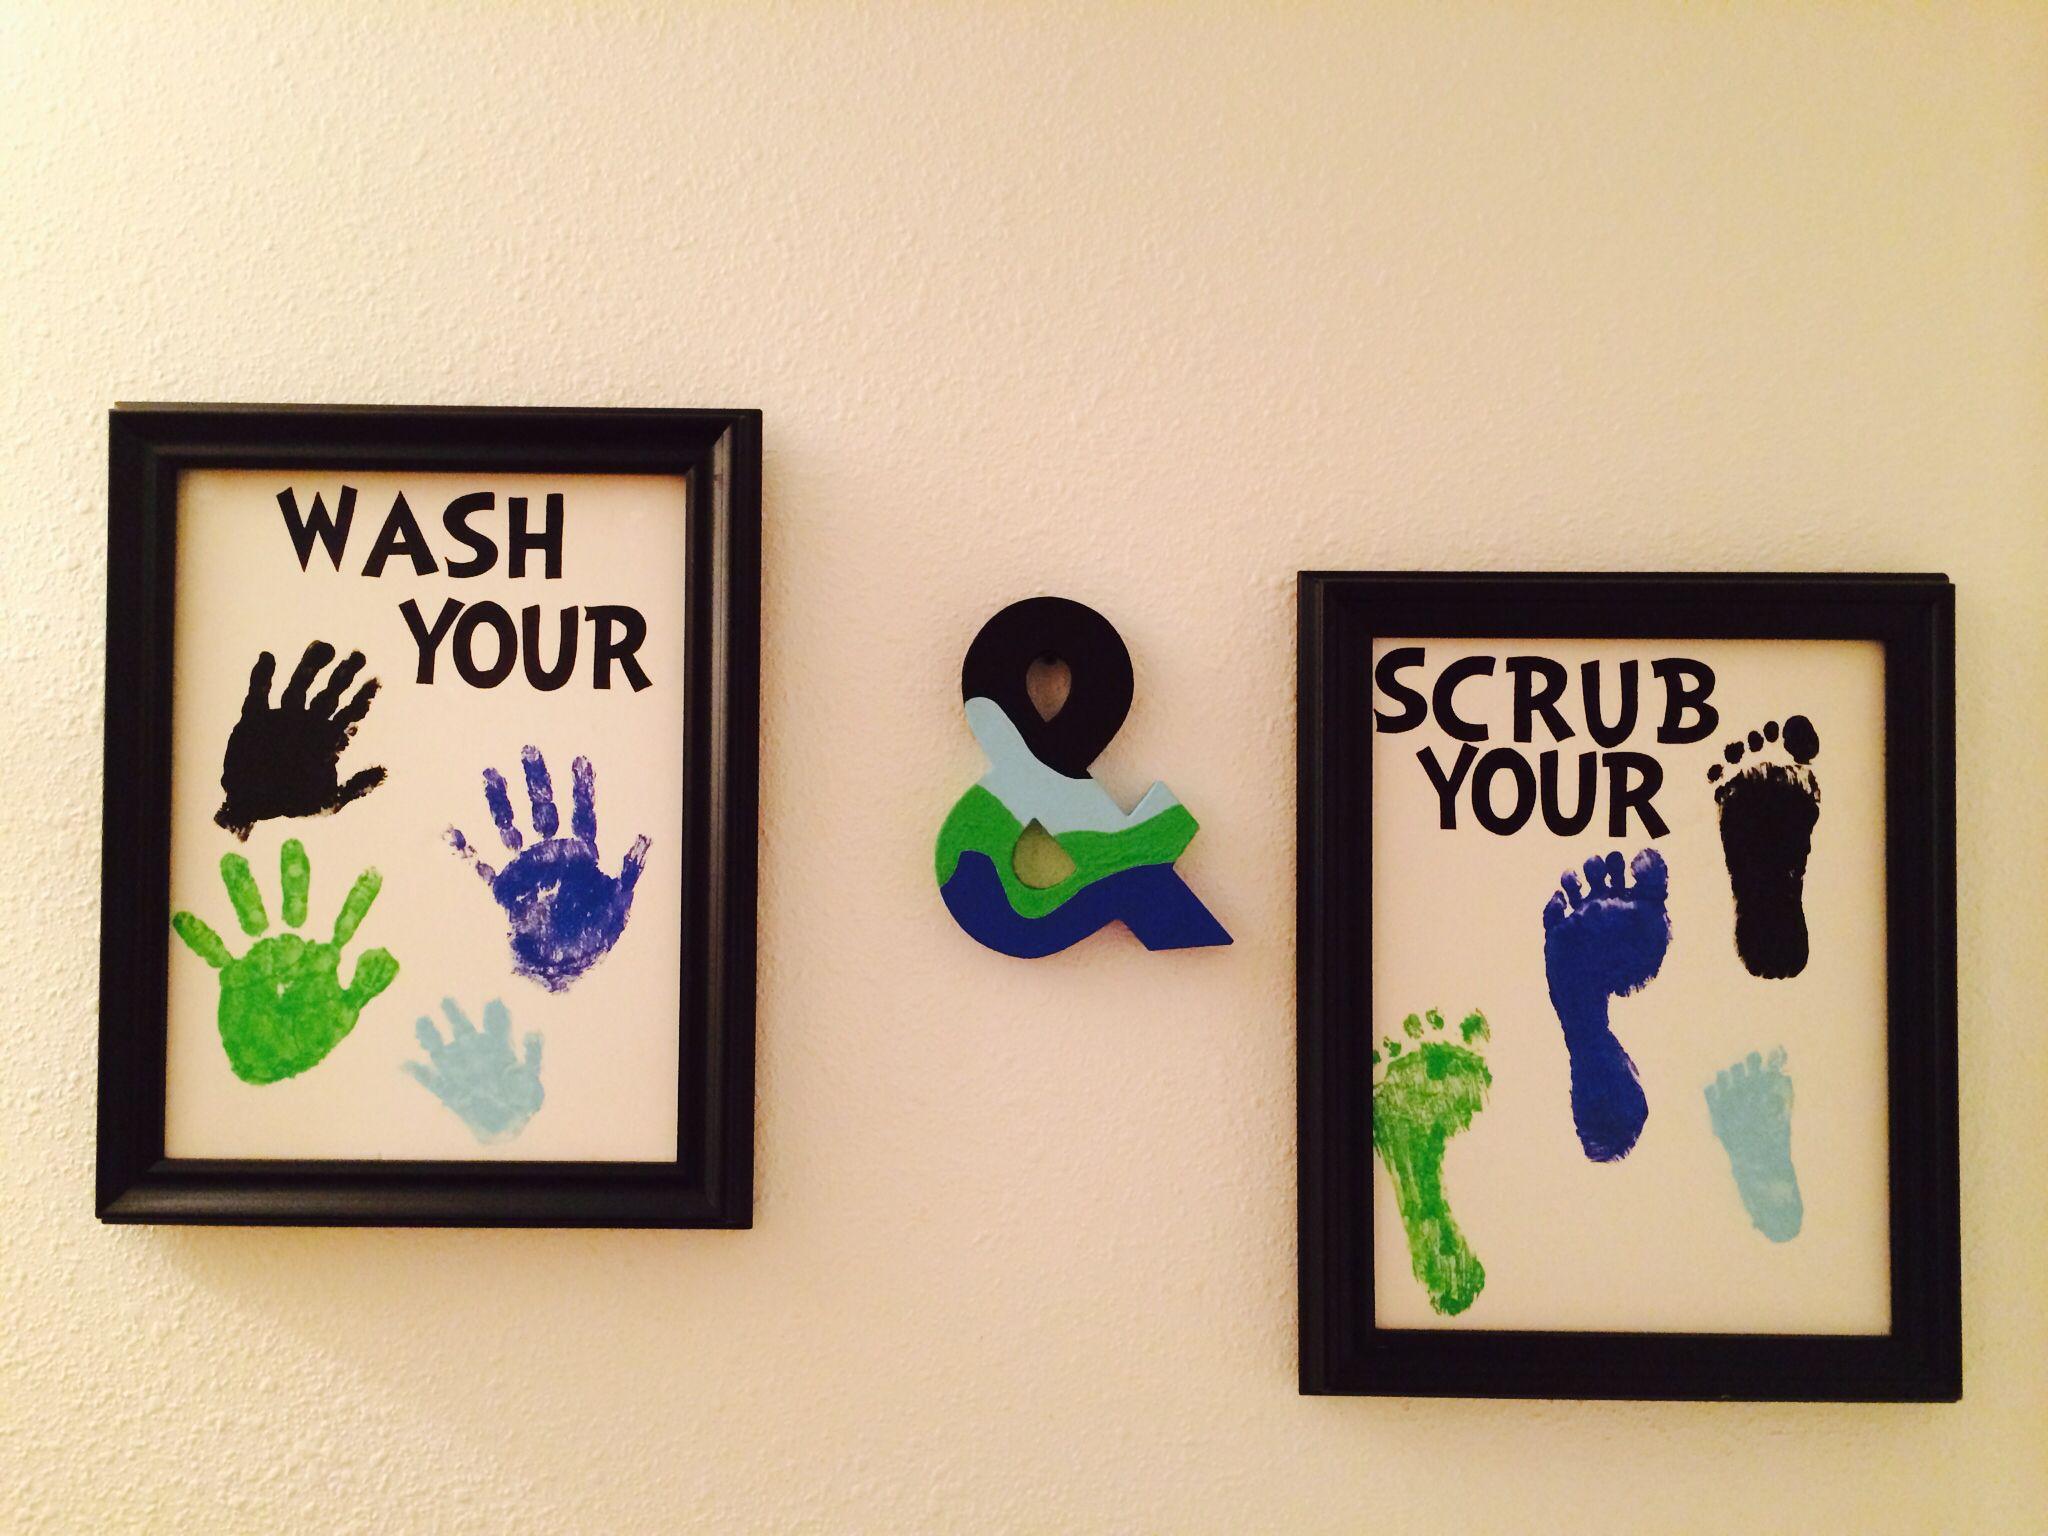 Bathroom Signs Wash Your Hands kids bathroom decor. wash your hands & scrub your feet signs. i